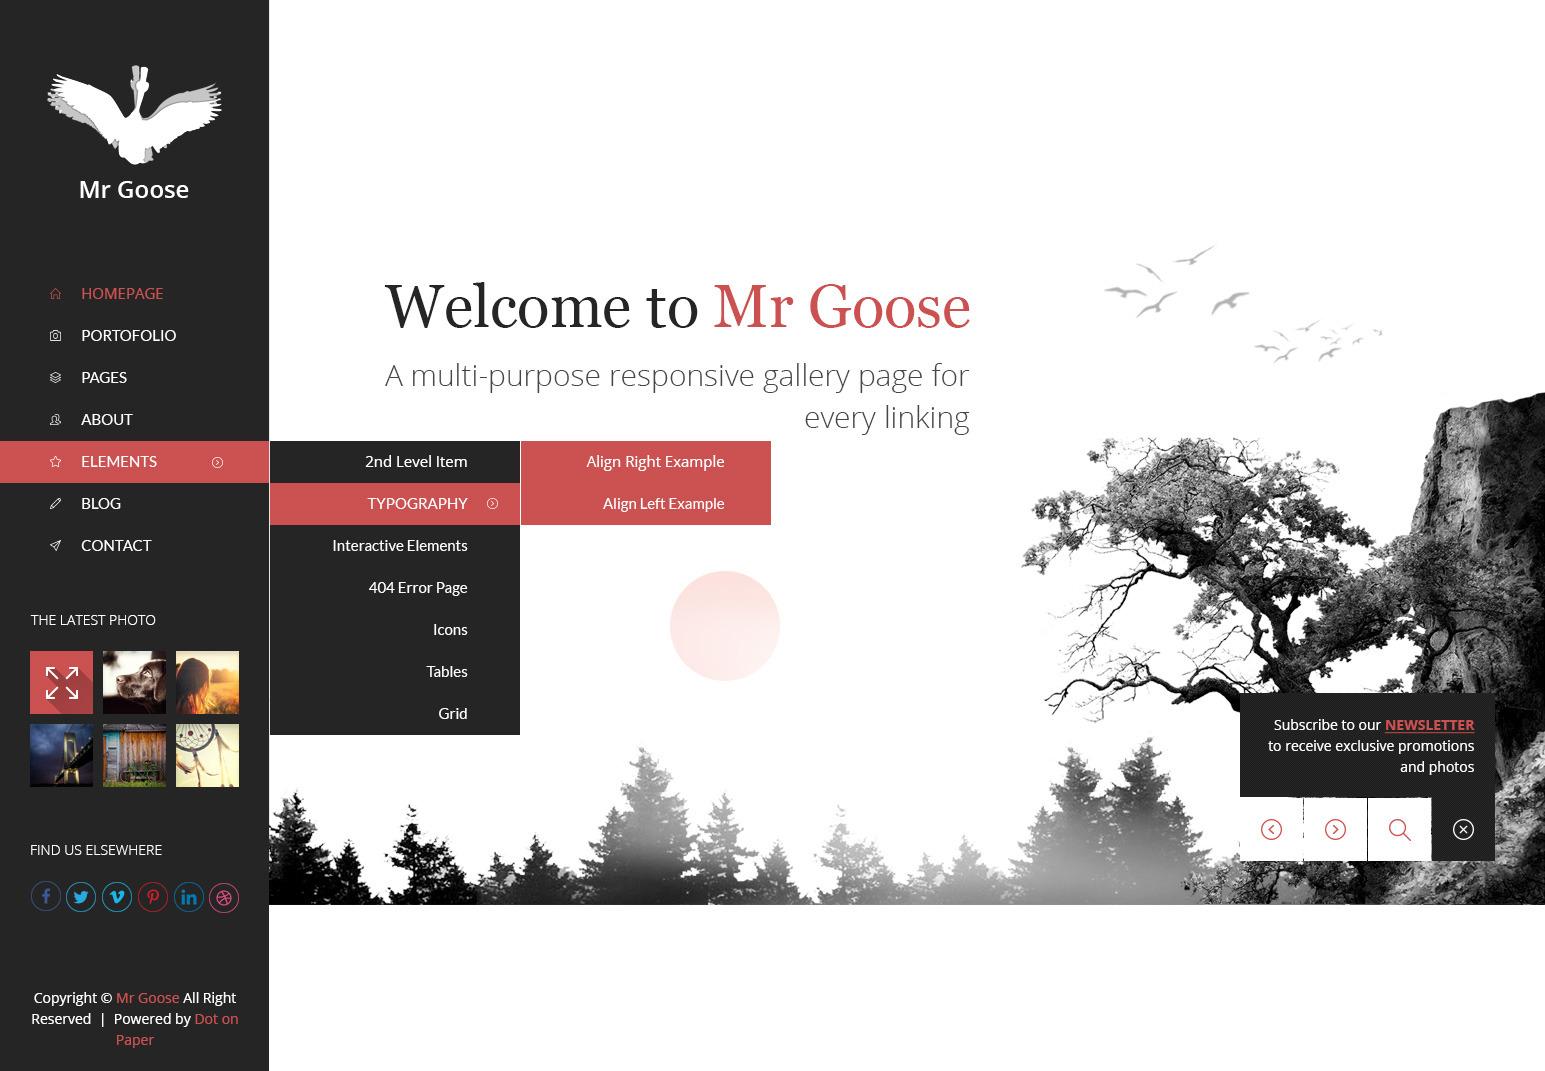 Mr Goose - Creative PSD Template - Desktop - Home Page